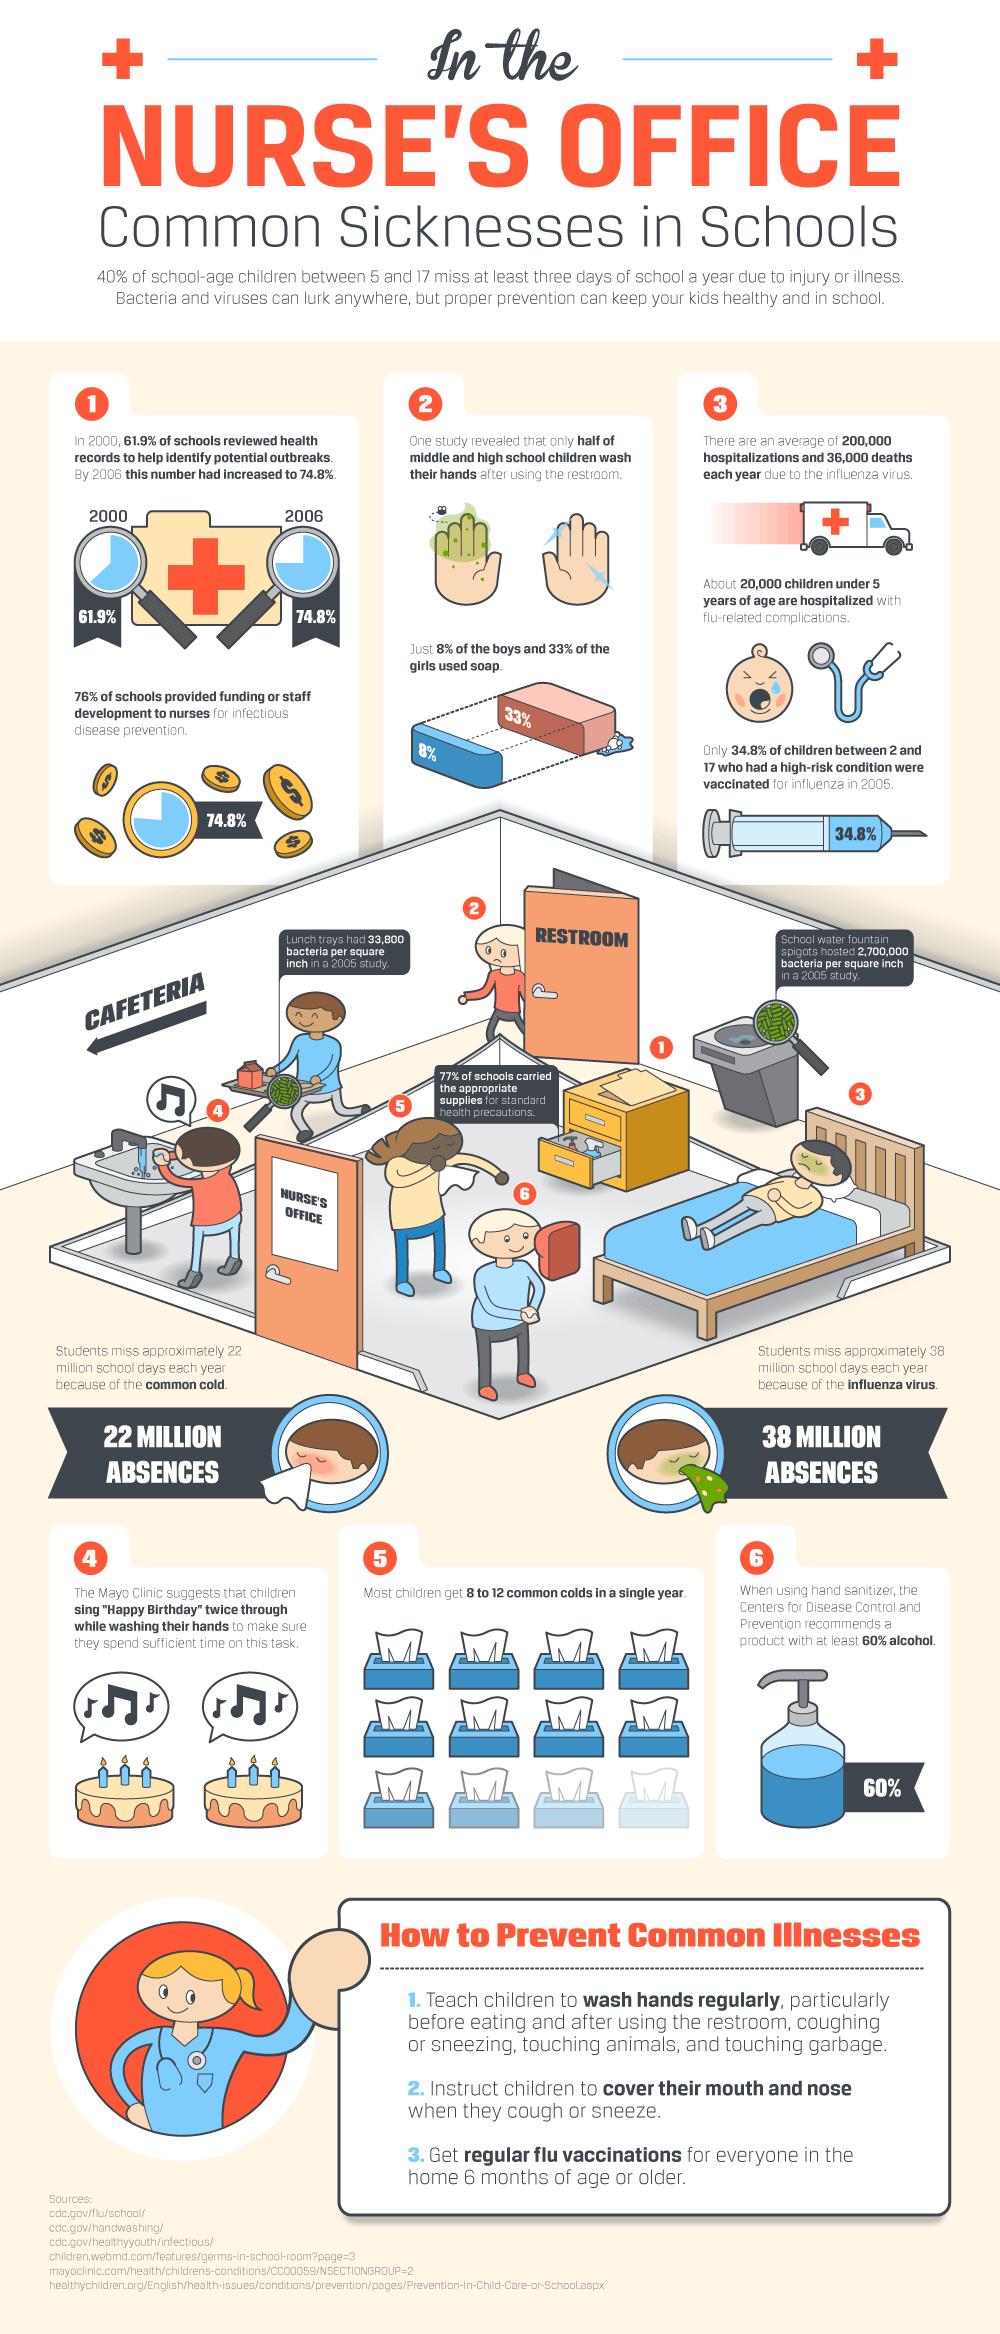 In the Nurse's Office: Common Sicknesses in Schools